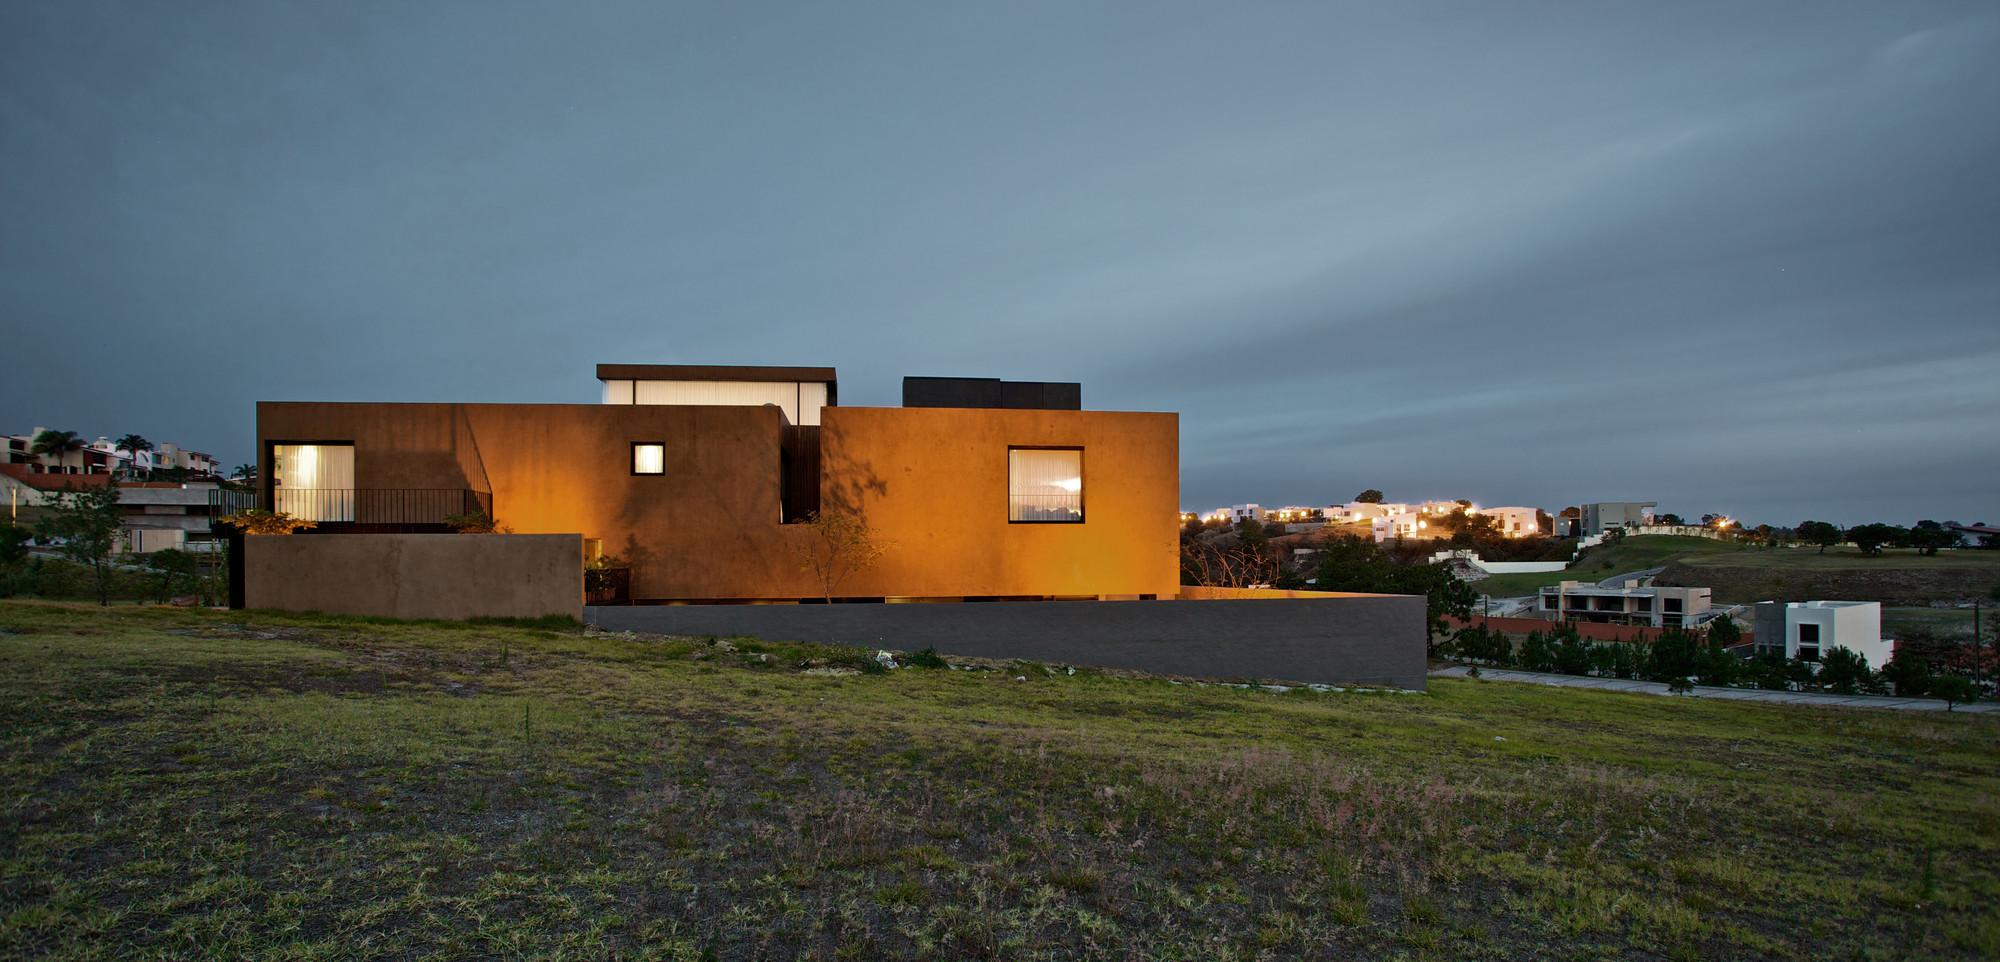 EPR House / Luis Aldrete, © Paco Pérez Arriaga